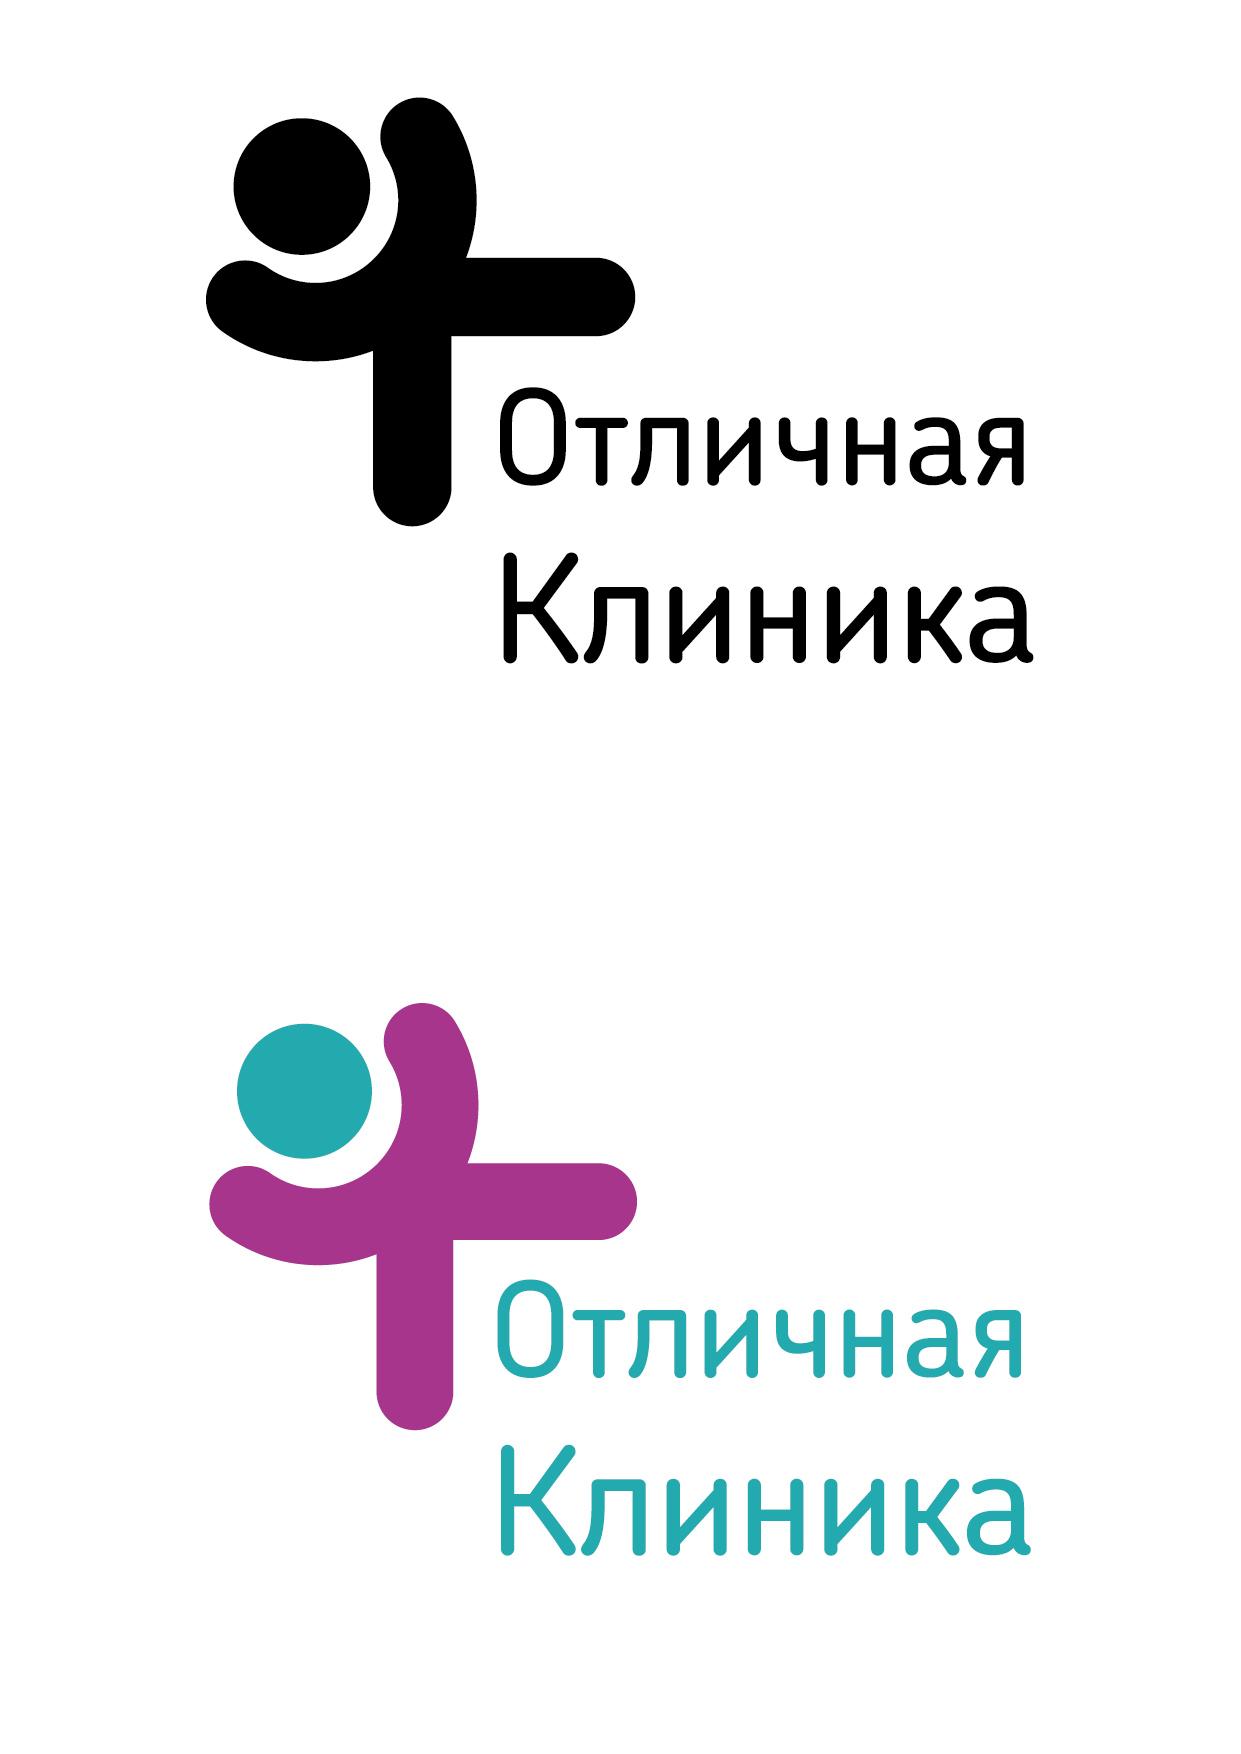 Логотип и фирменный стиль частной клиники фото f_7795c926cb03f92e.jpg